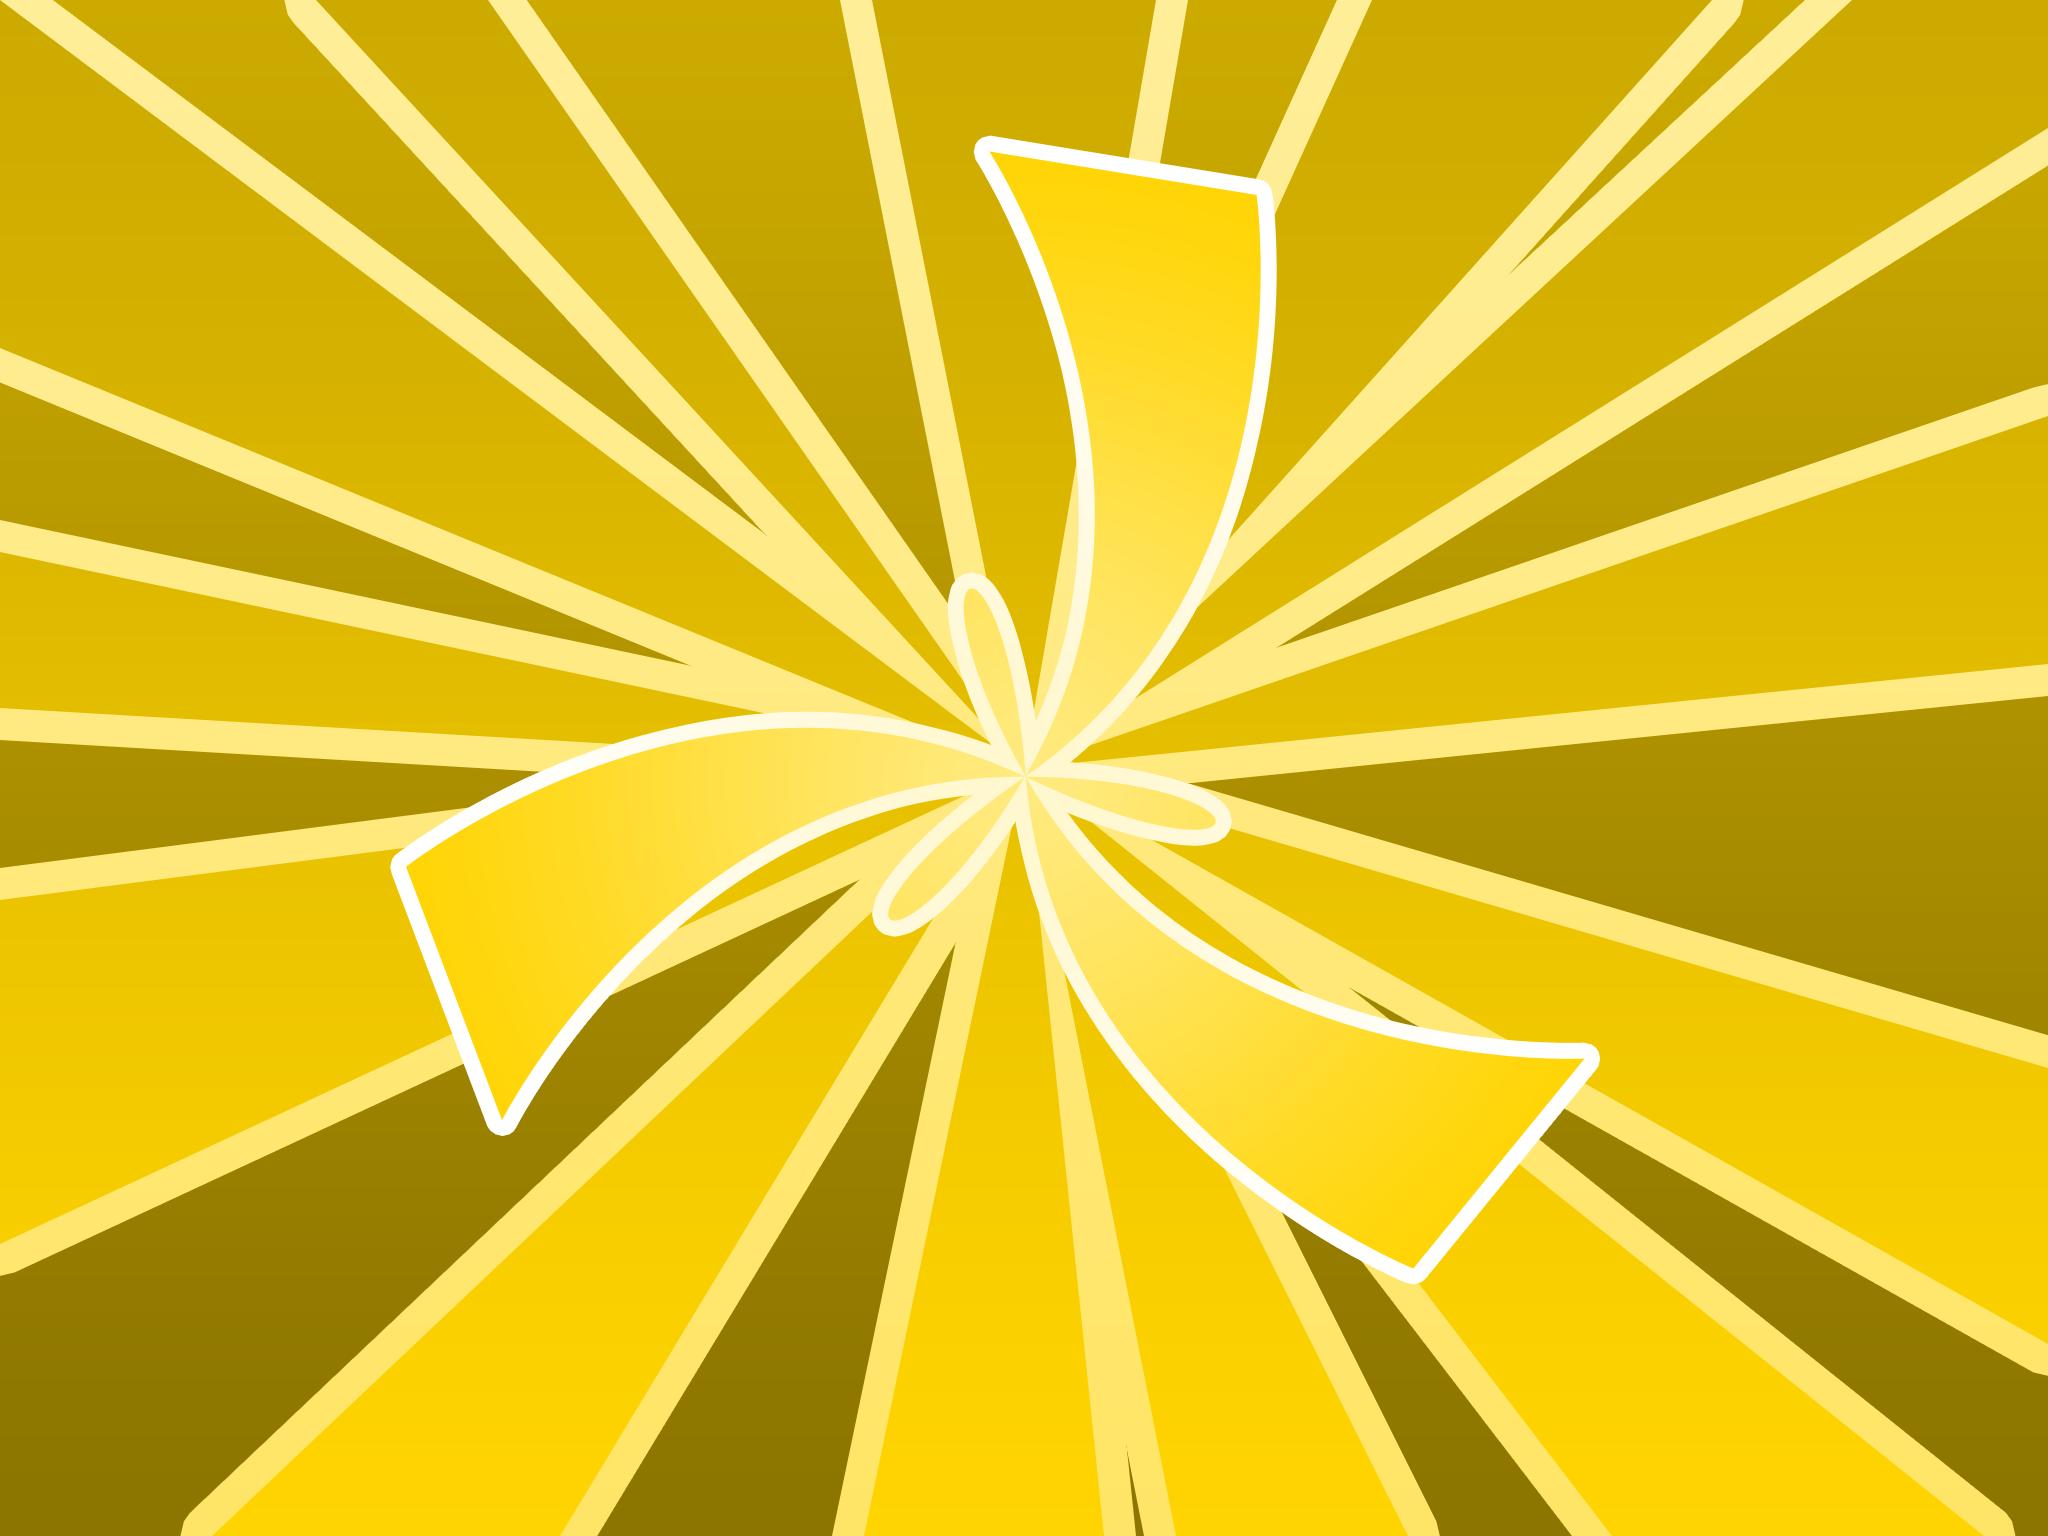 Bright Yellow Wallpaper 13 Wide Wallpaper 2048x1536 HD Wallpaper 2048x1536